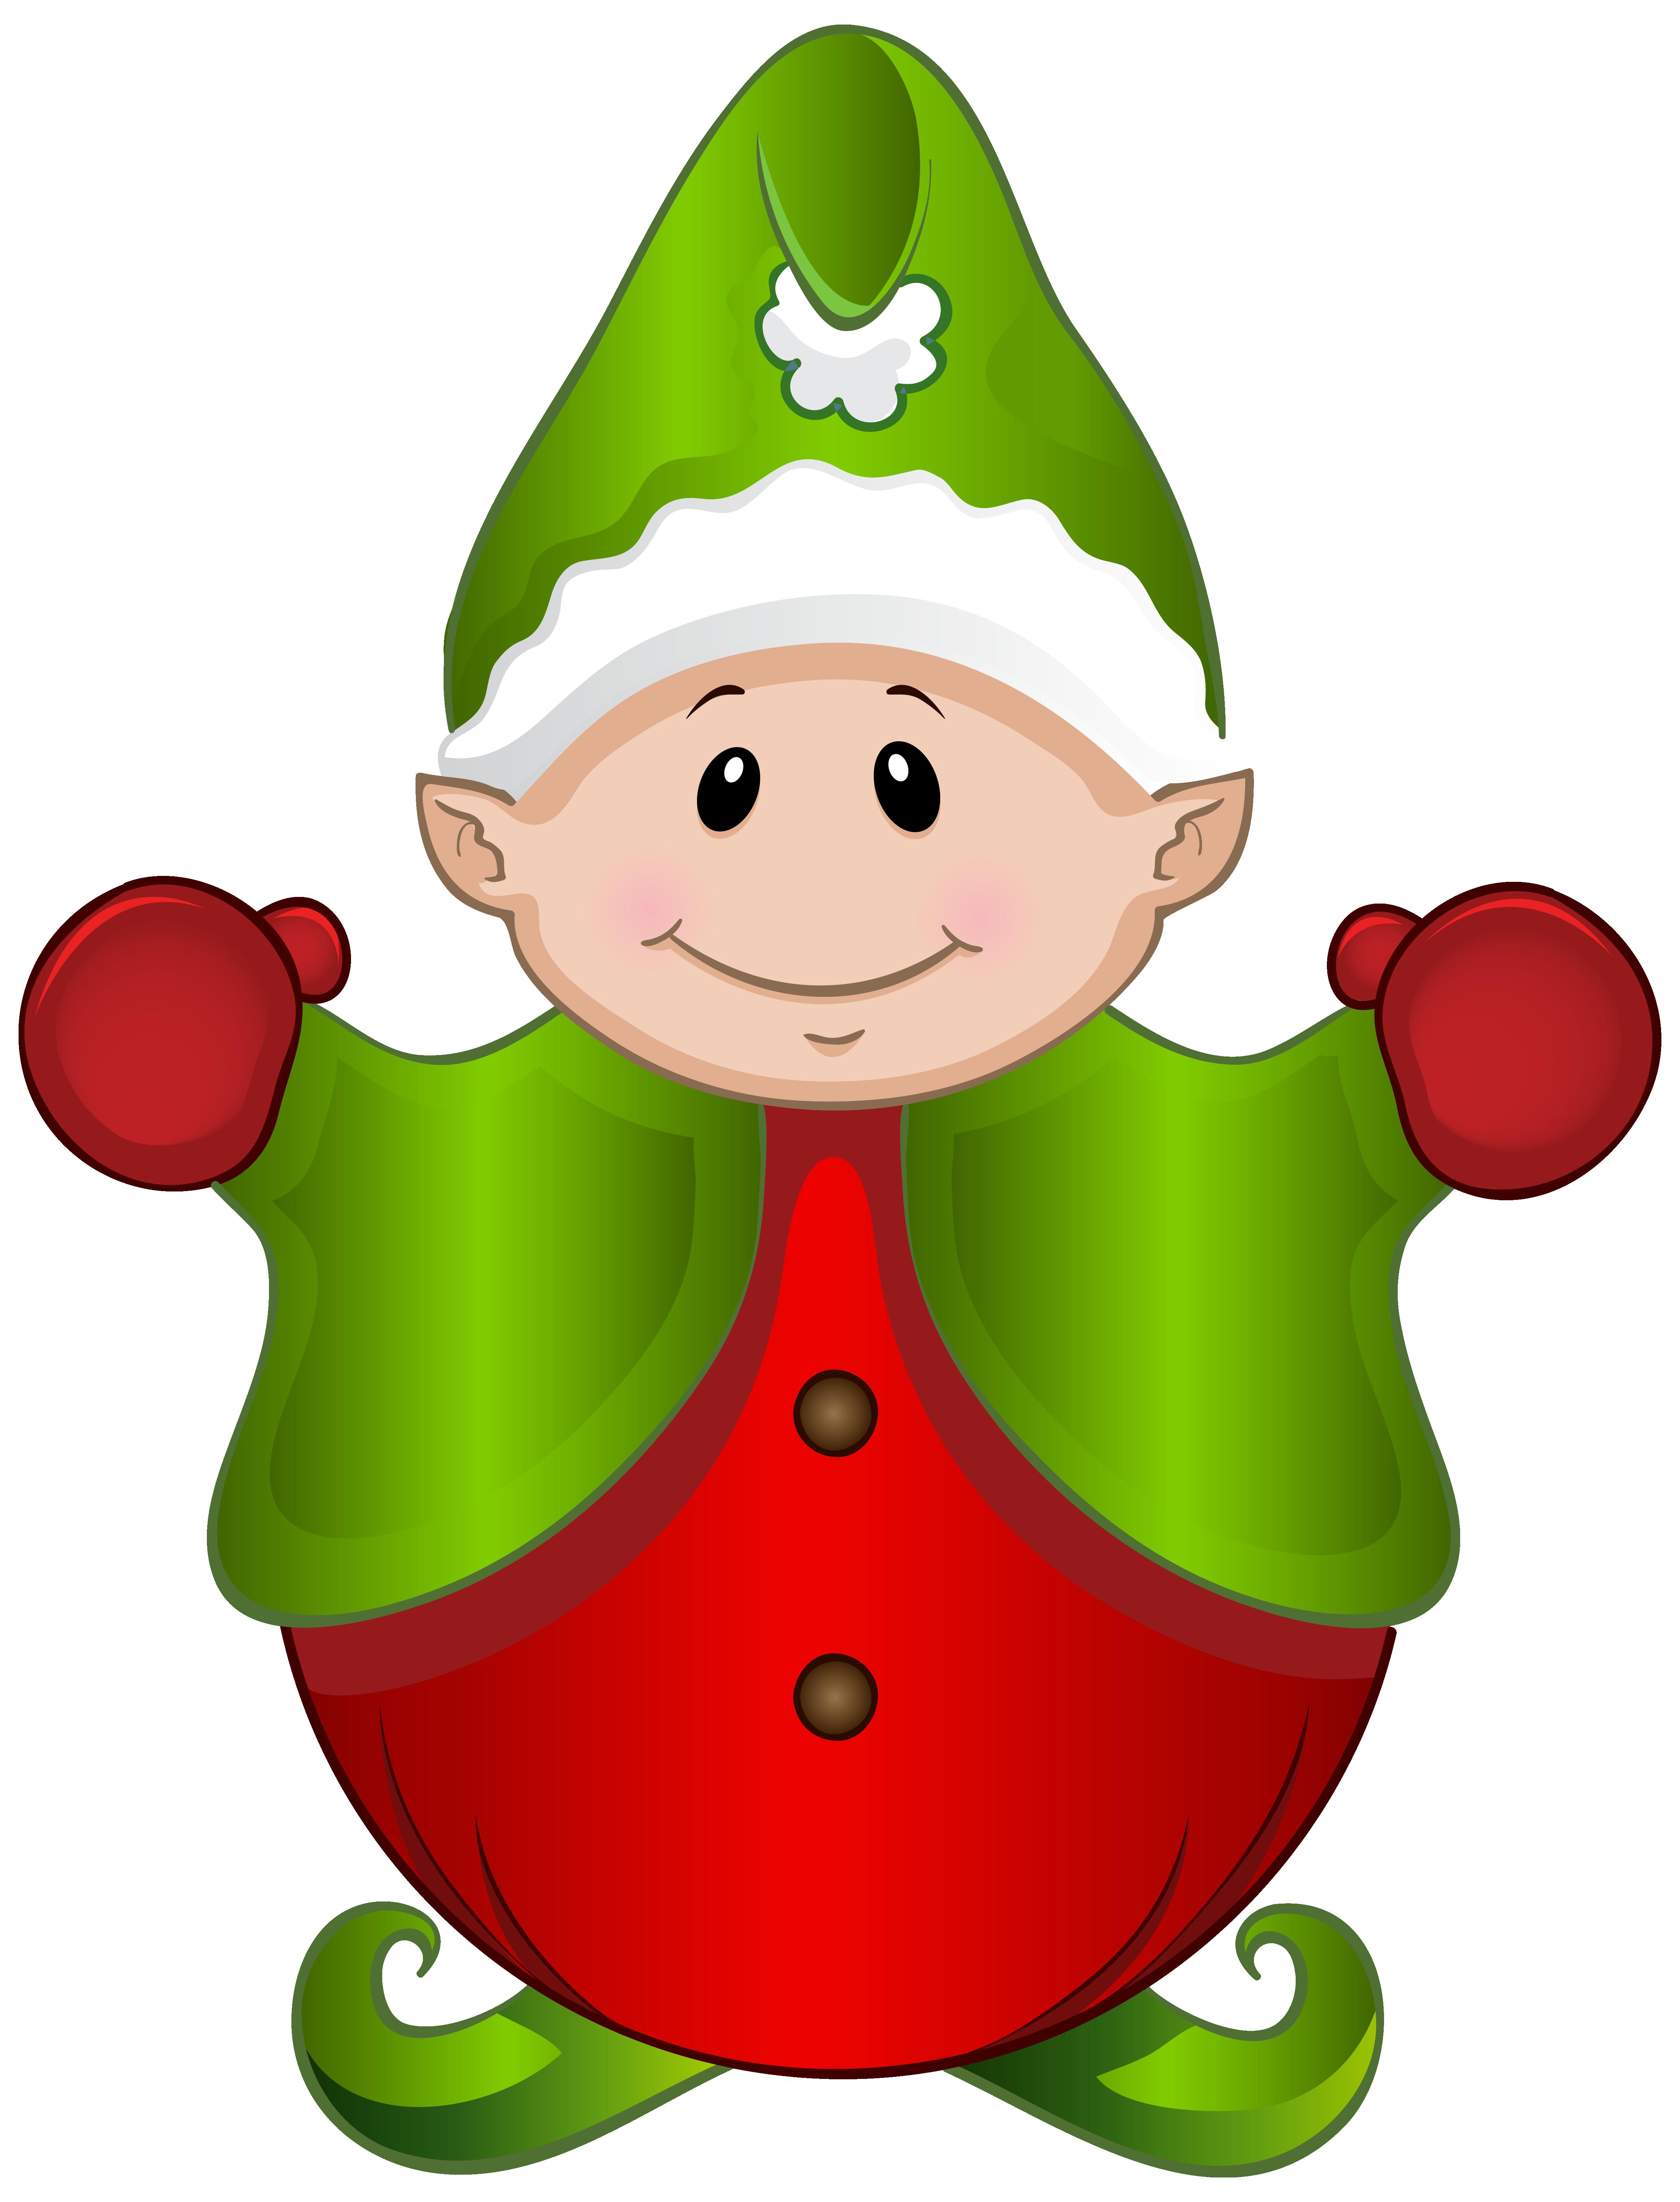 Cute Elf PNG Clipart Image - Cute Elves PNG